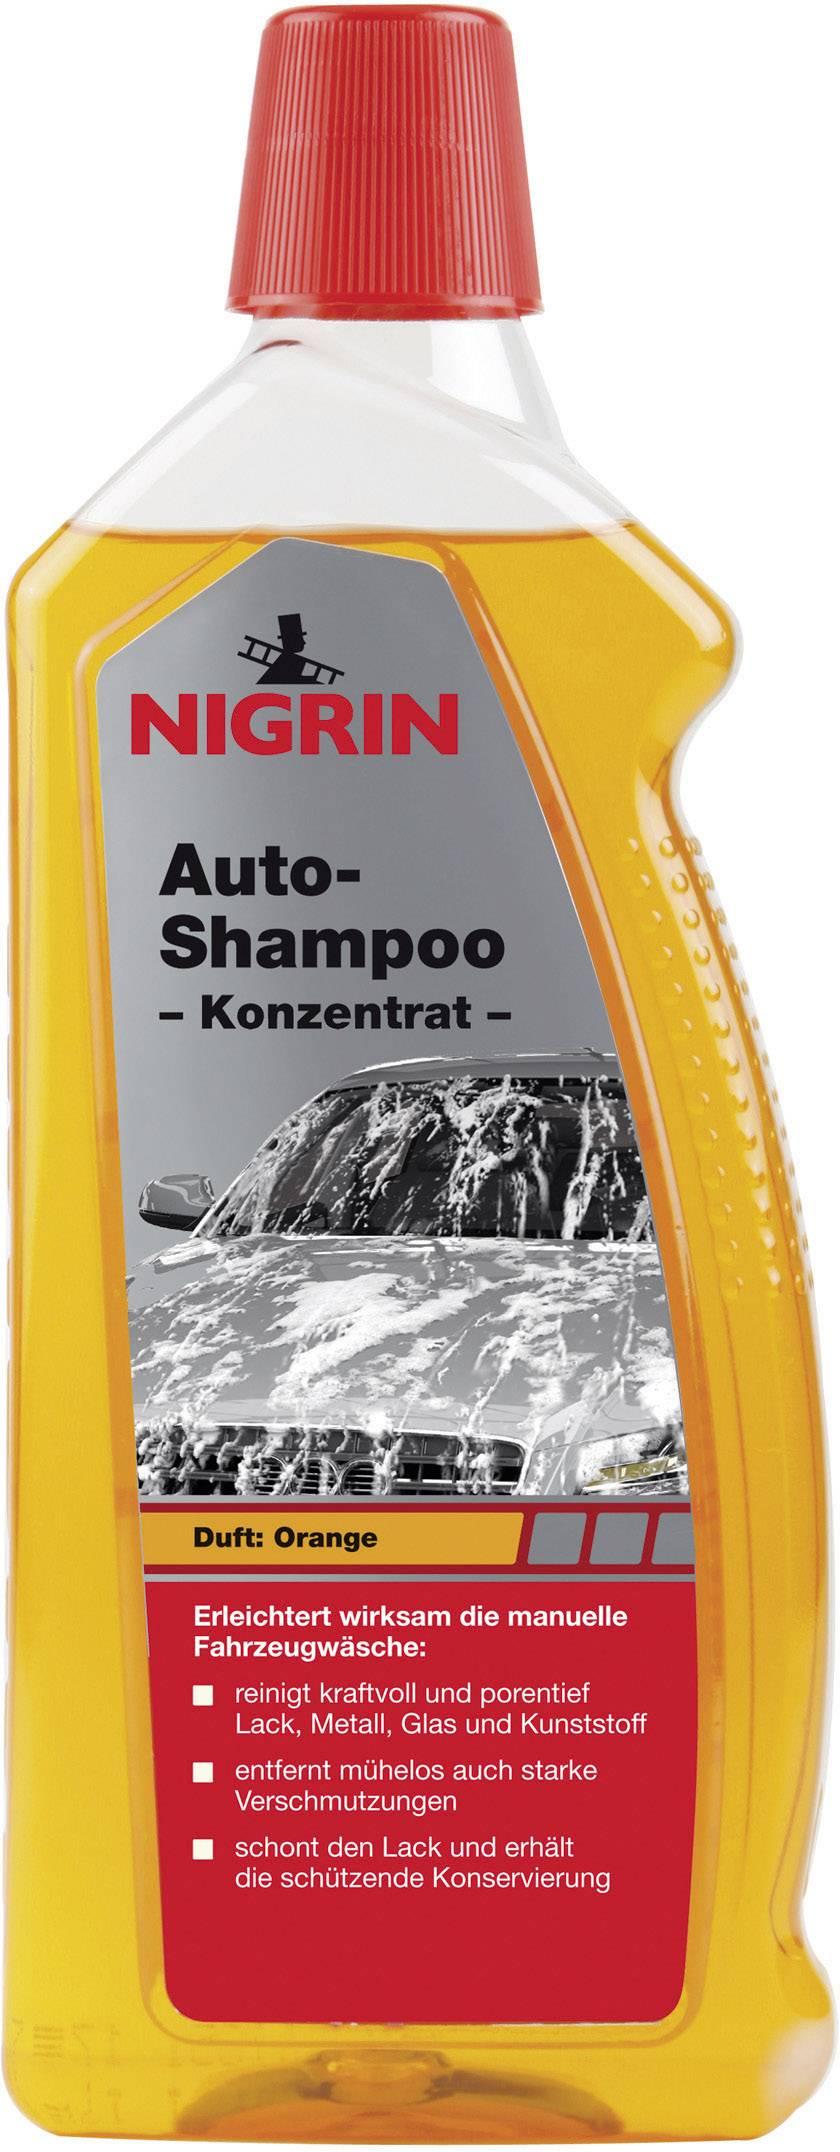 Autoshampoo Konzentrat Nigrin  73920 1 l